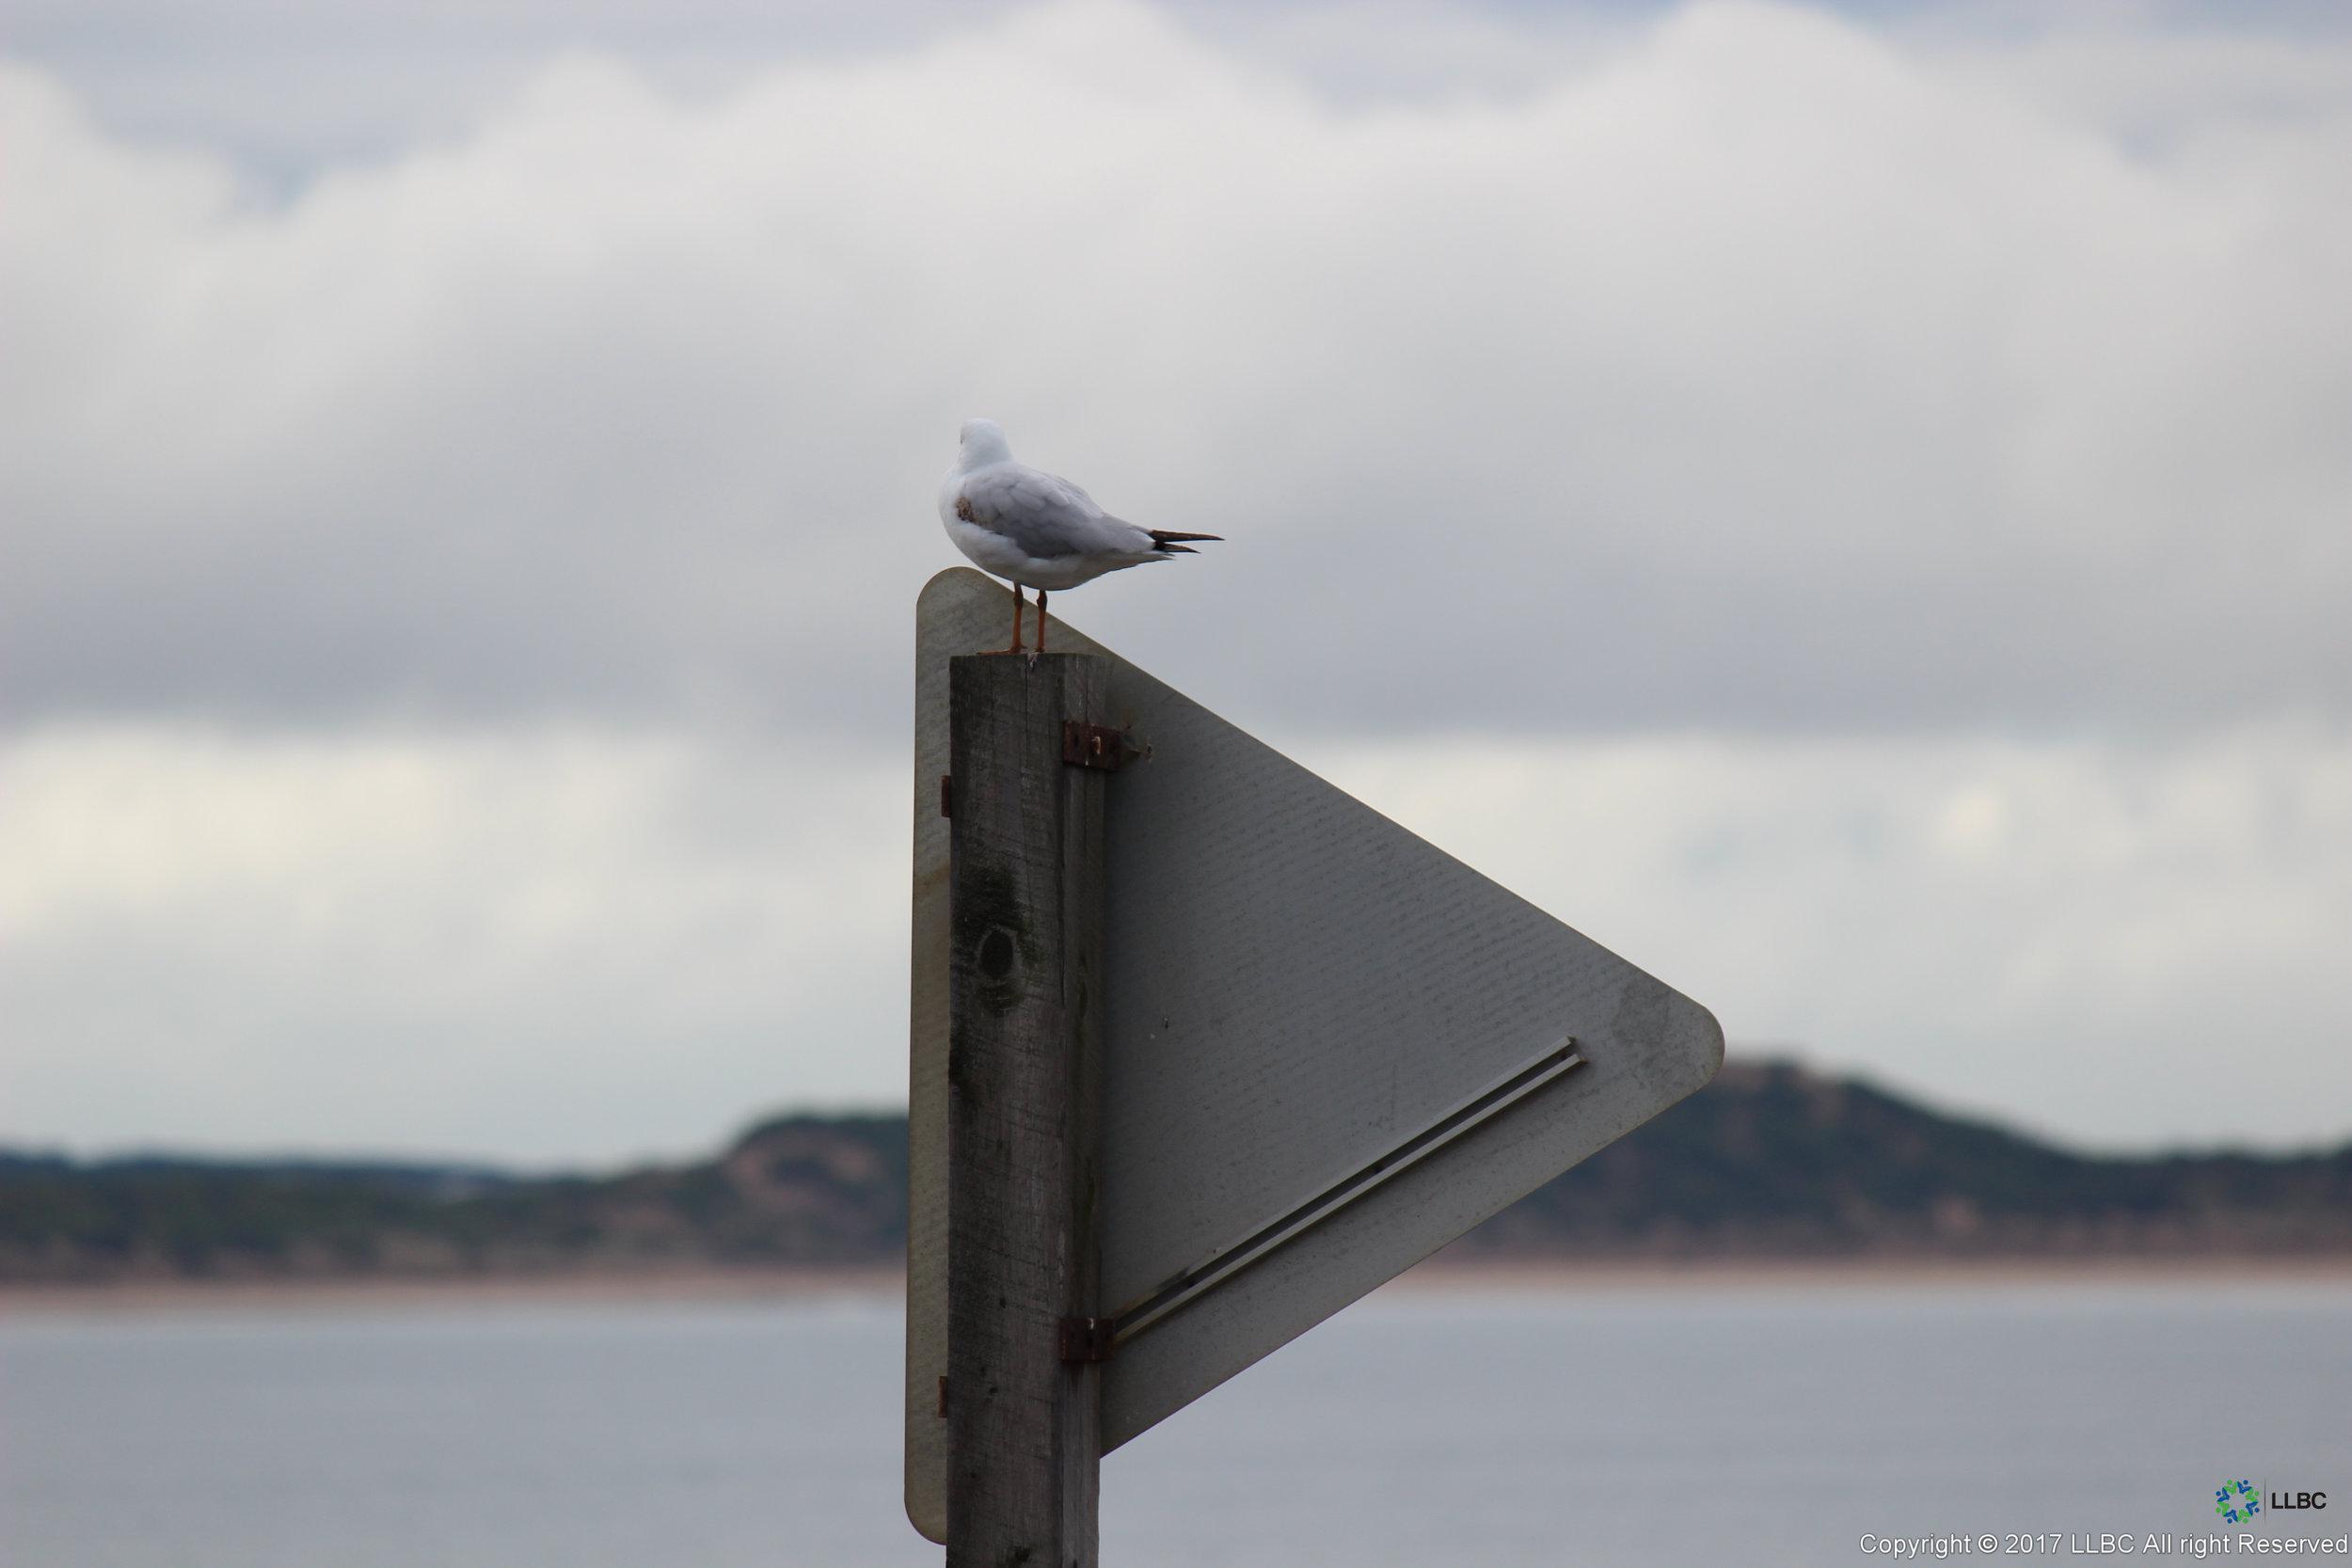 Sign from Behind - Bird.jpg